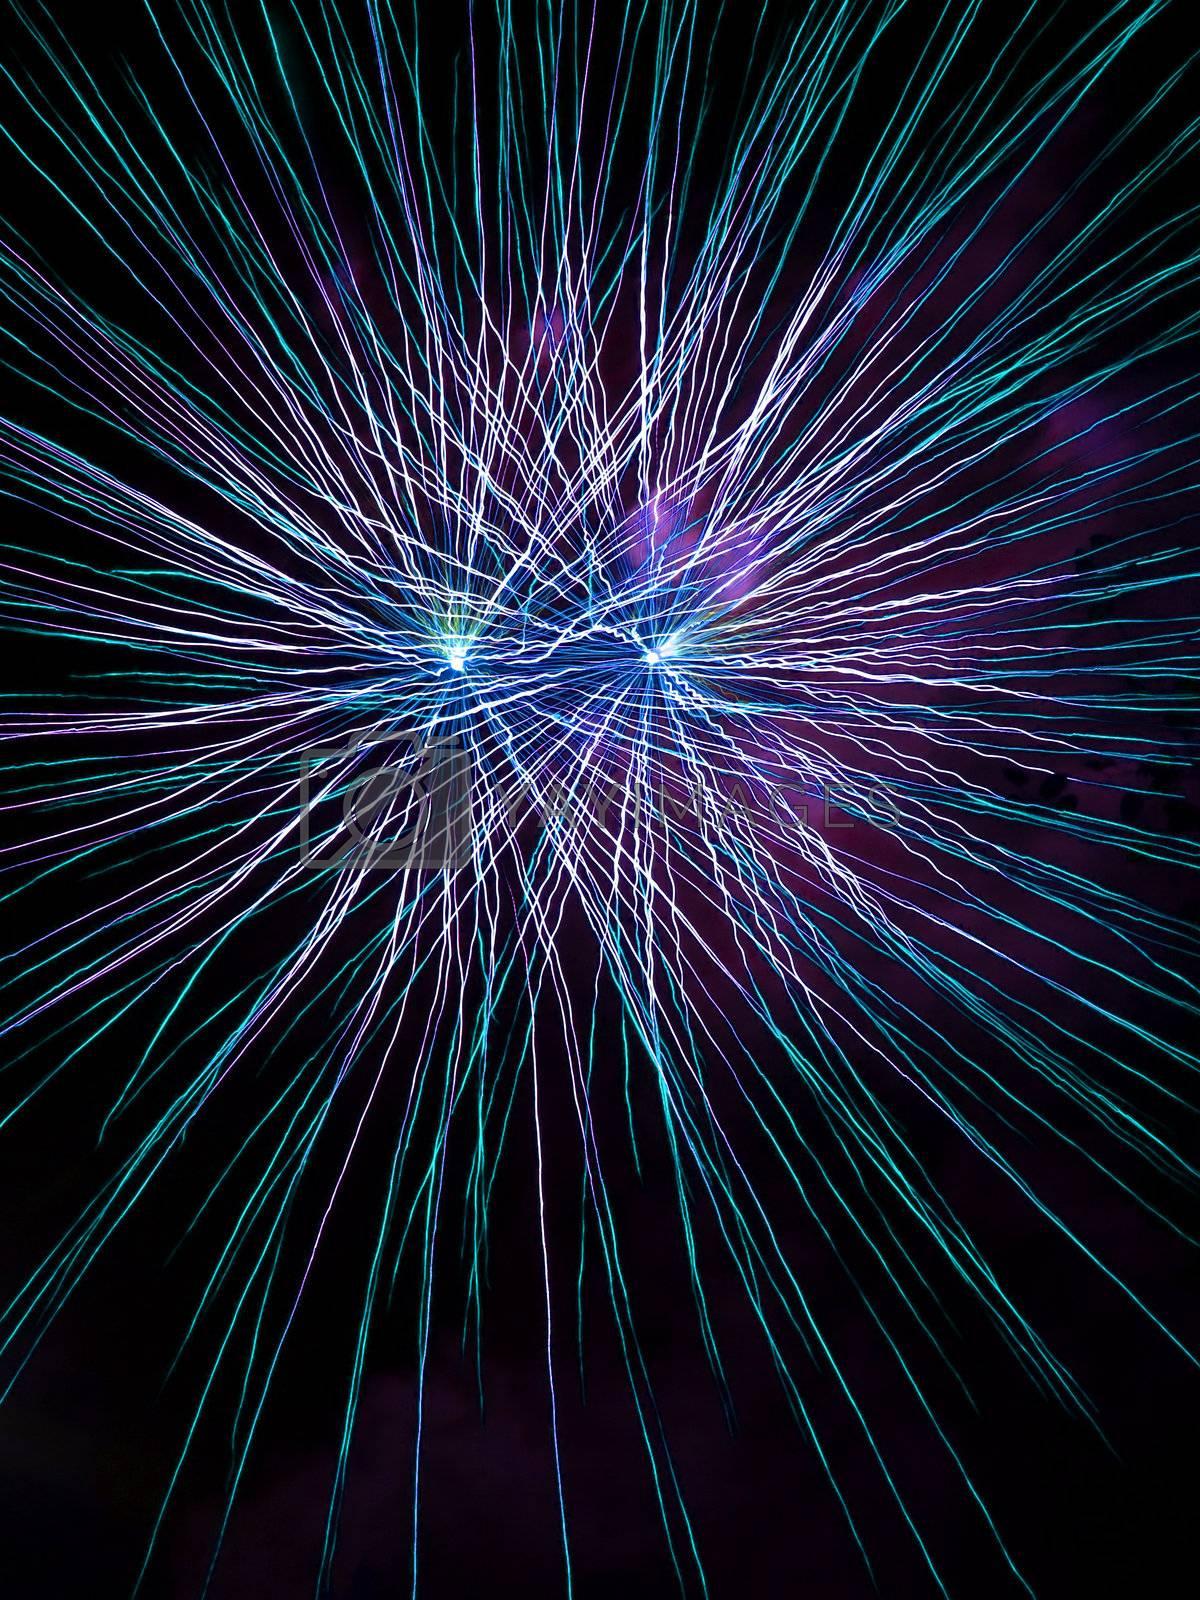 Long Exposure of Purple Fireworks Against a Black Sky